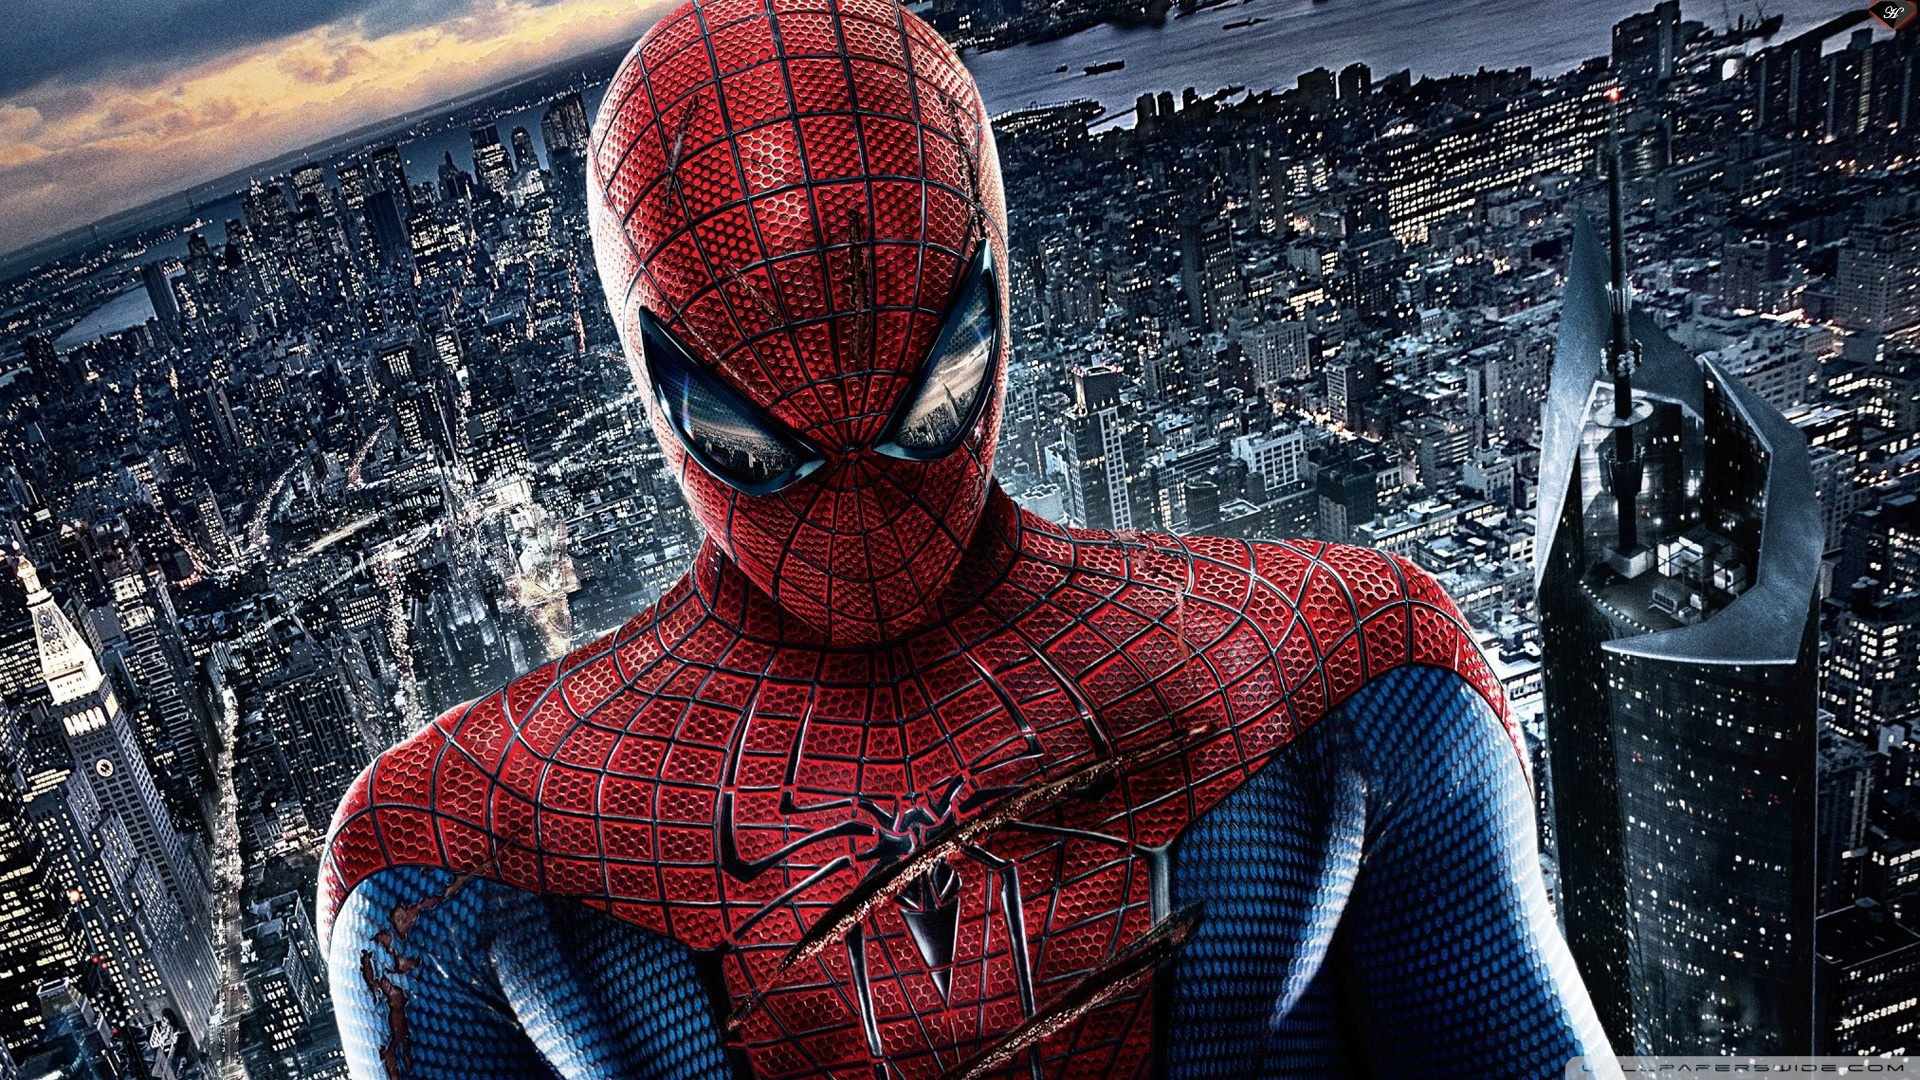 The Amazing Spider Man HD Desktop Wallpaper High Definition Src